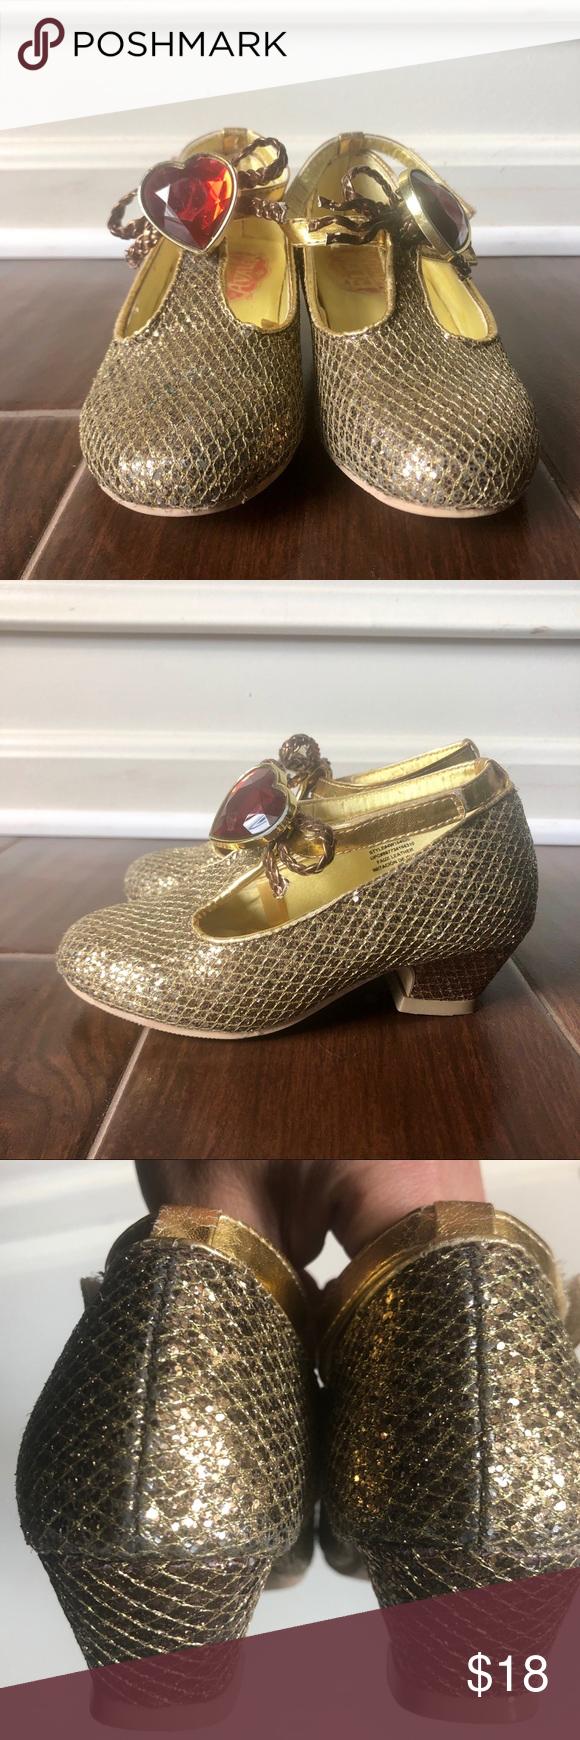 Disney Elena of Avalor Gold Shoes w